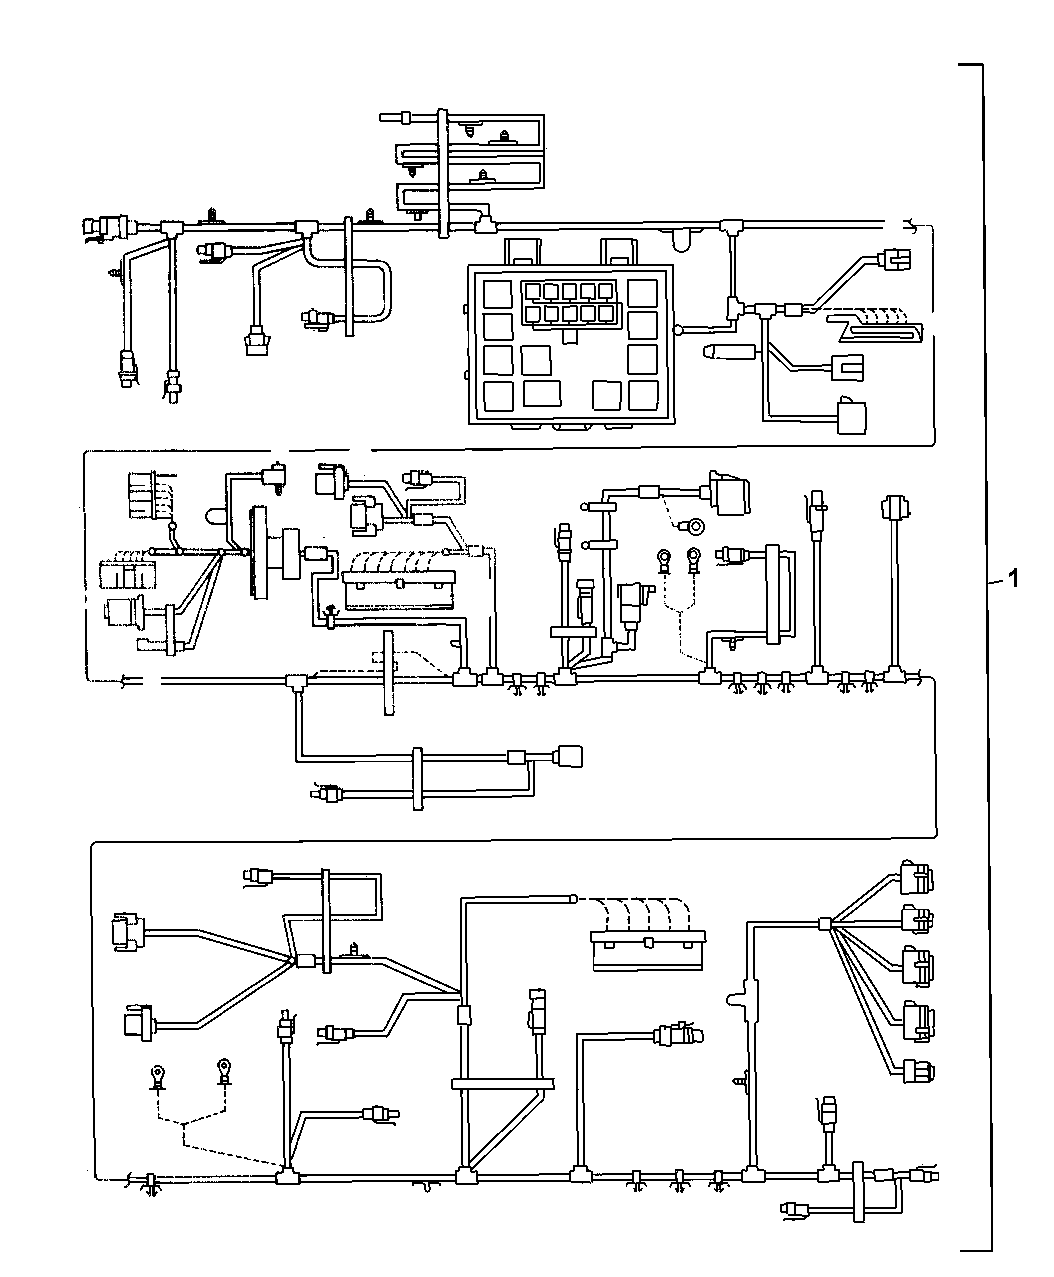 98 Dodge Intrepid Wiring Diagram - Wiring Diagram Networks